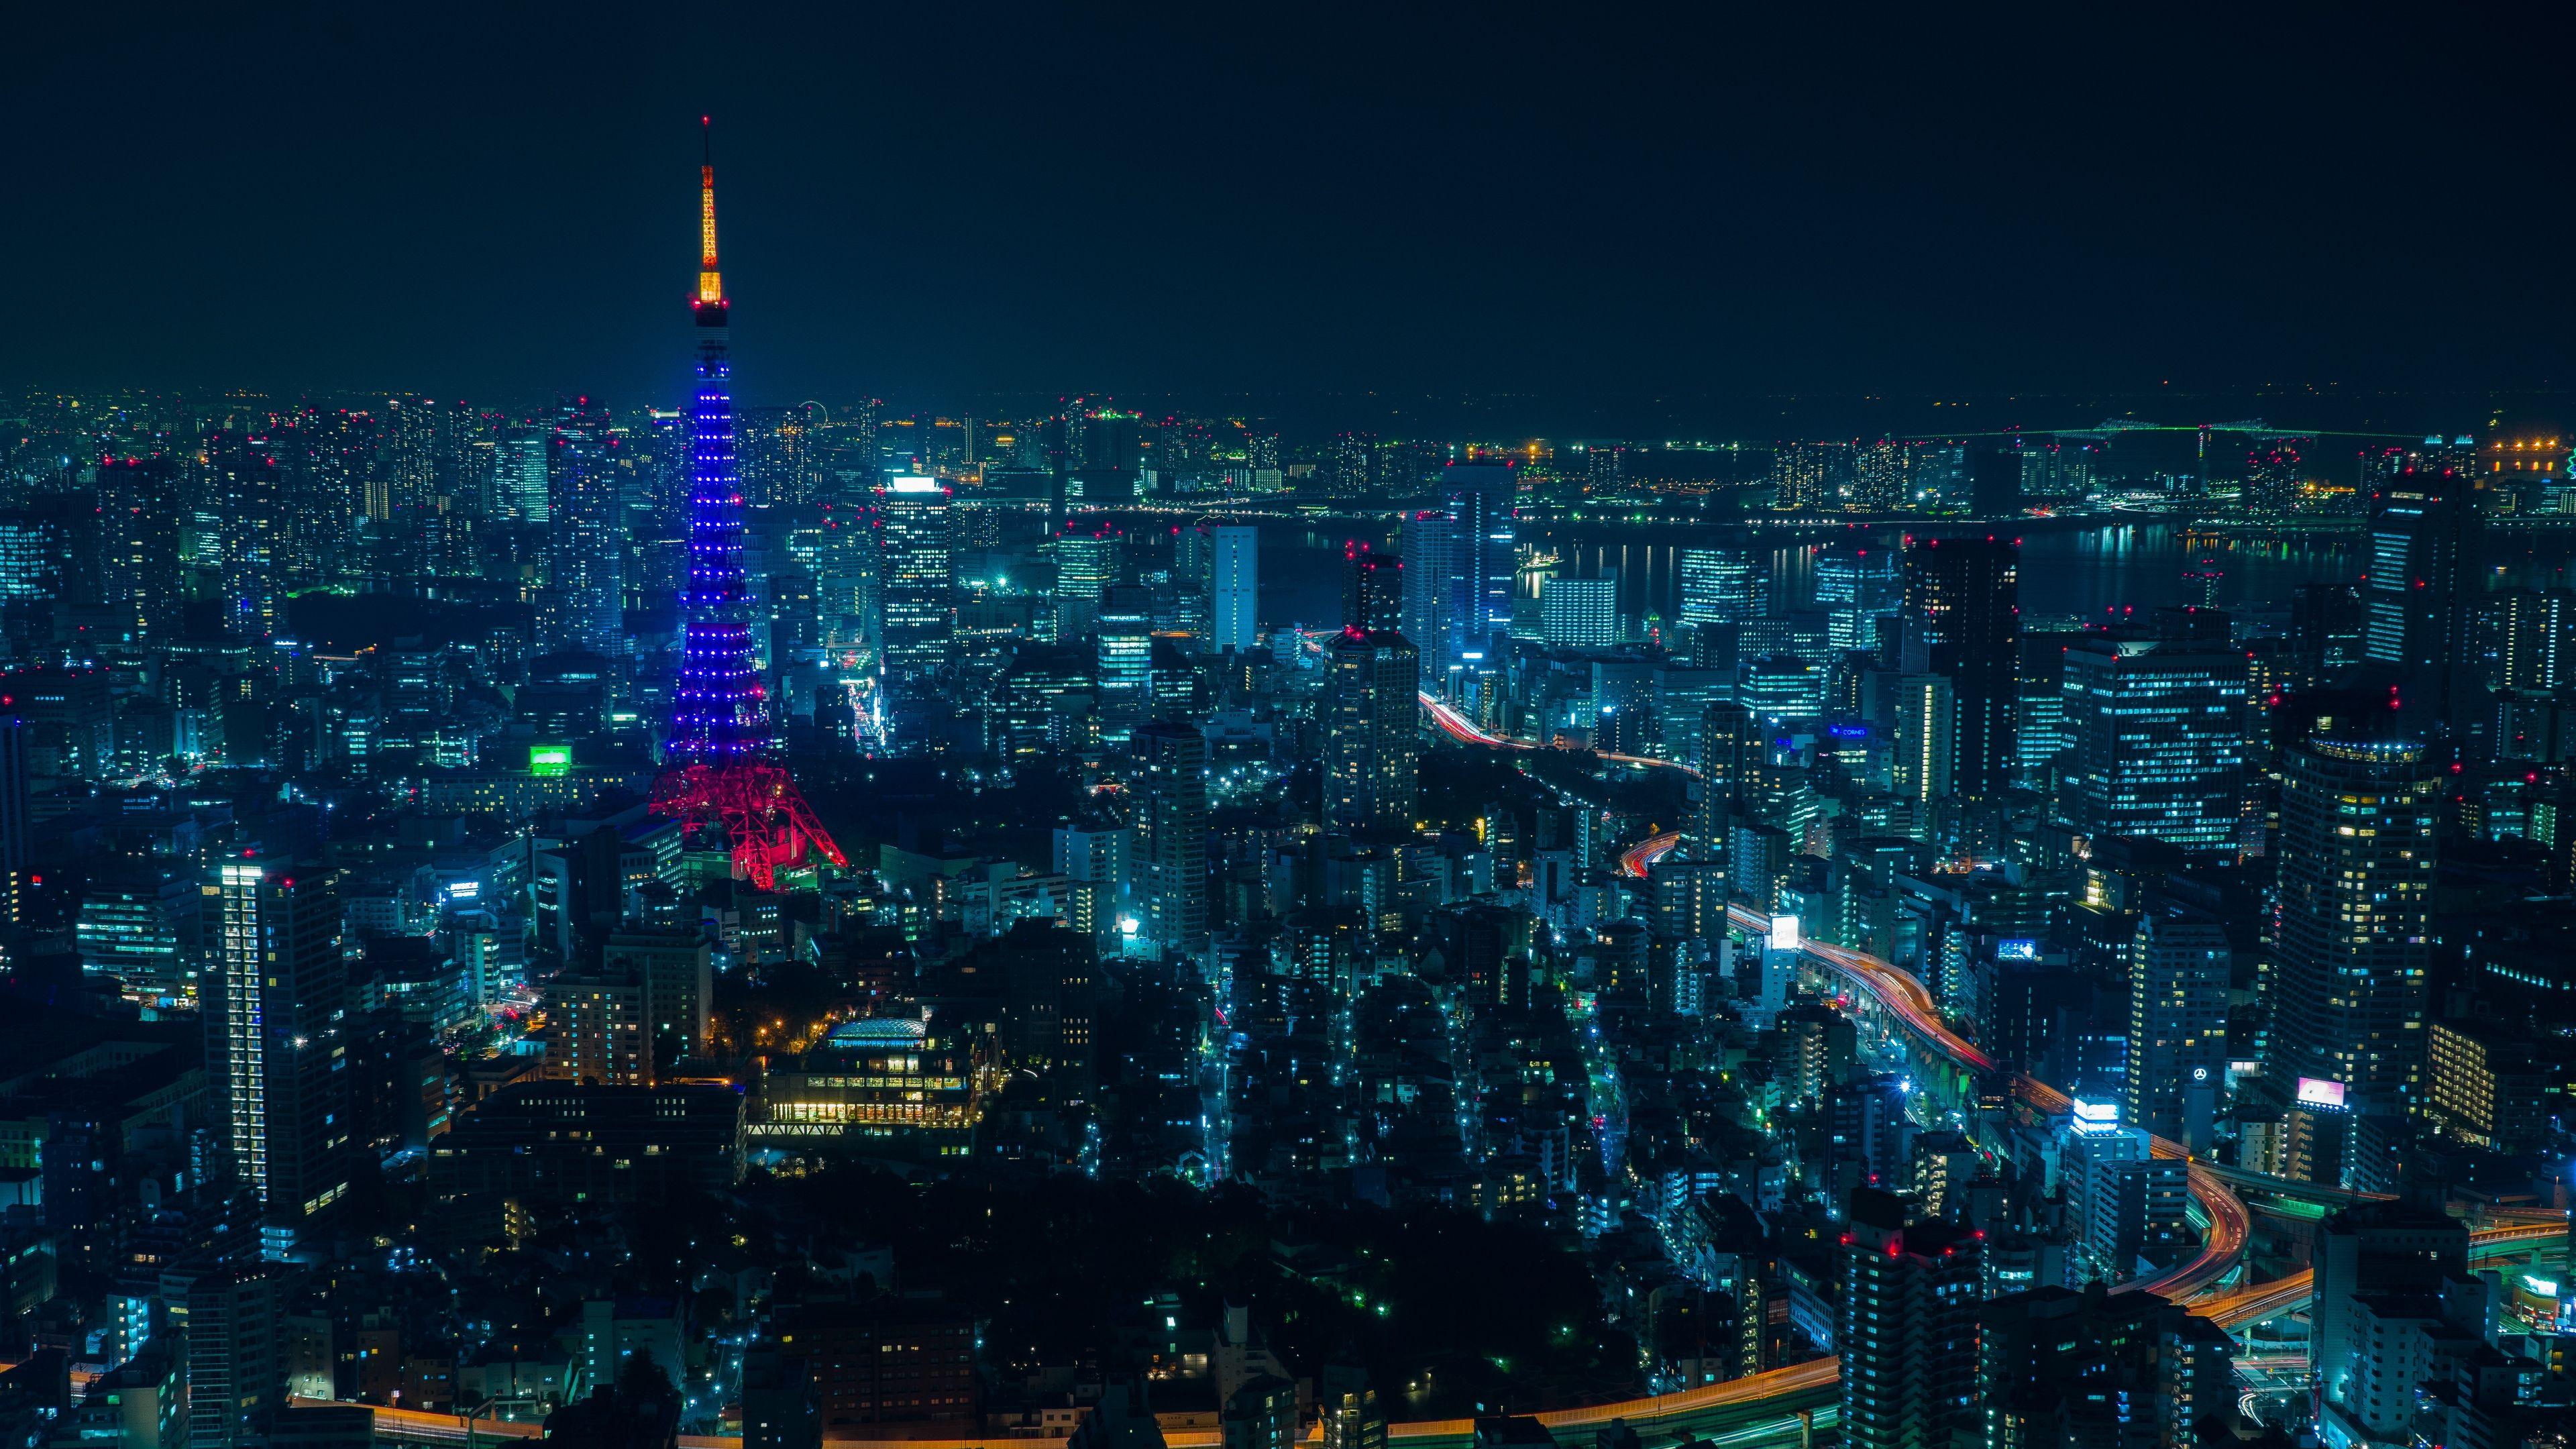 Tokyo Night City Skyscrapers 4k Tokyo Skyscrapers Night City In 2020 Tokyo Tower Tokyo Night Tokyo Picture